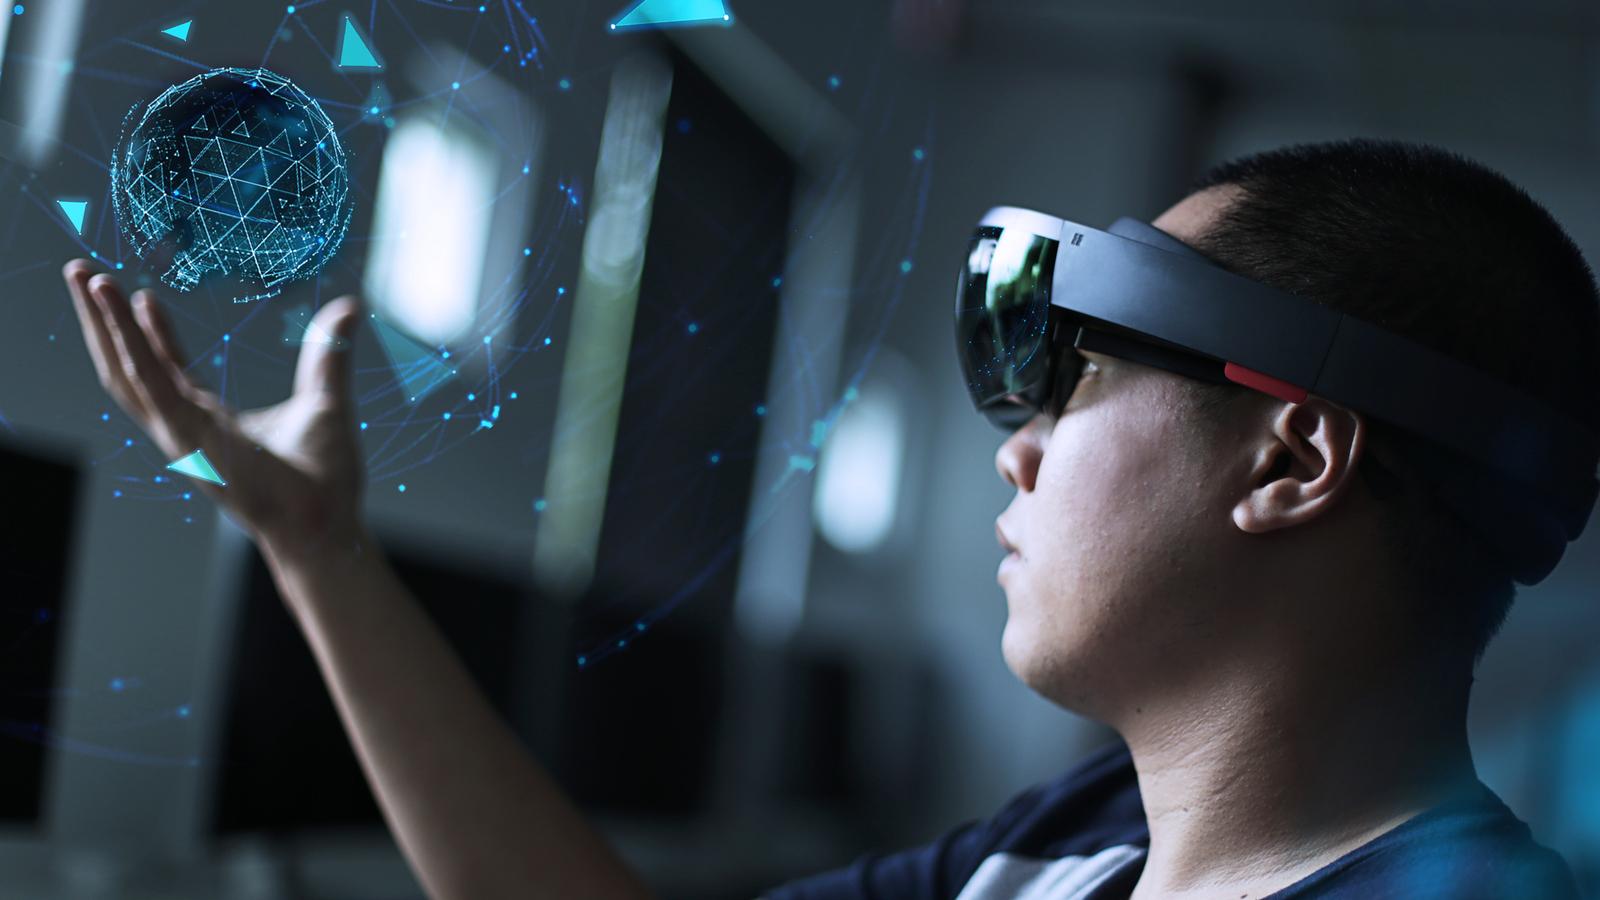 3D Media Unveils Data-Digitizing Tool for Manifest Enterprise AR Platform from Taqtile